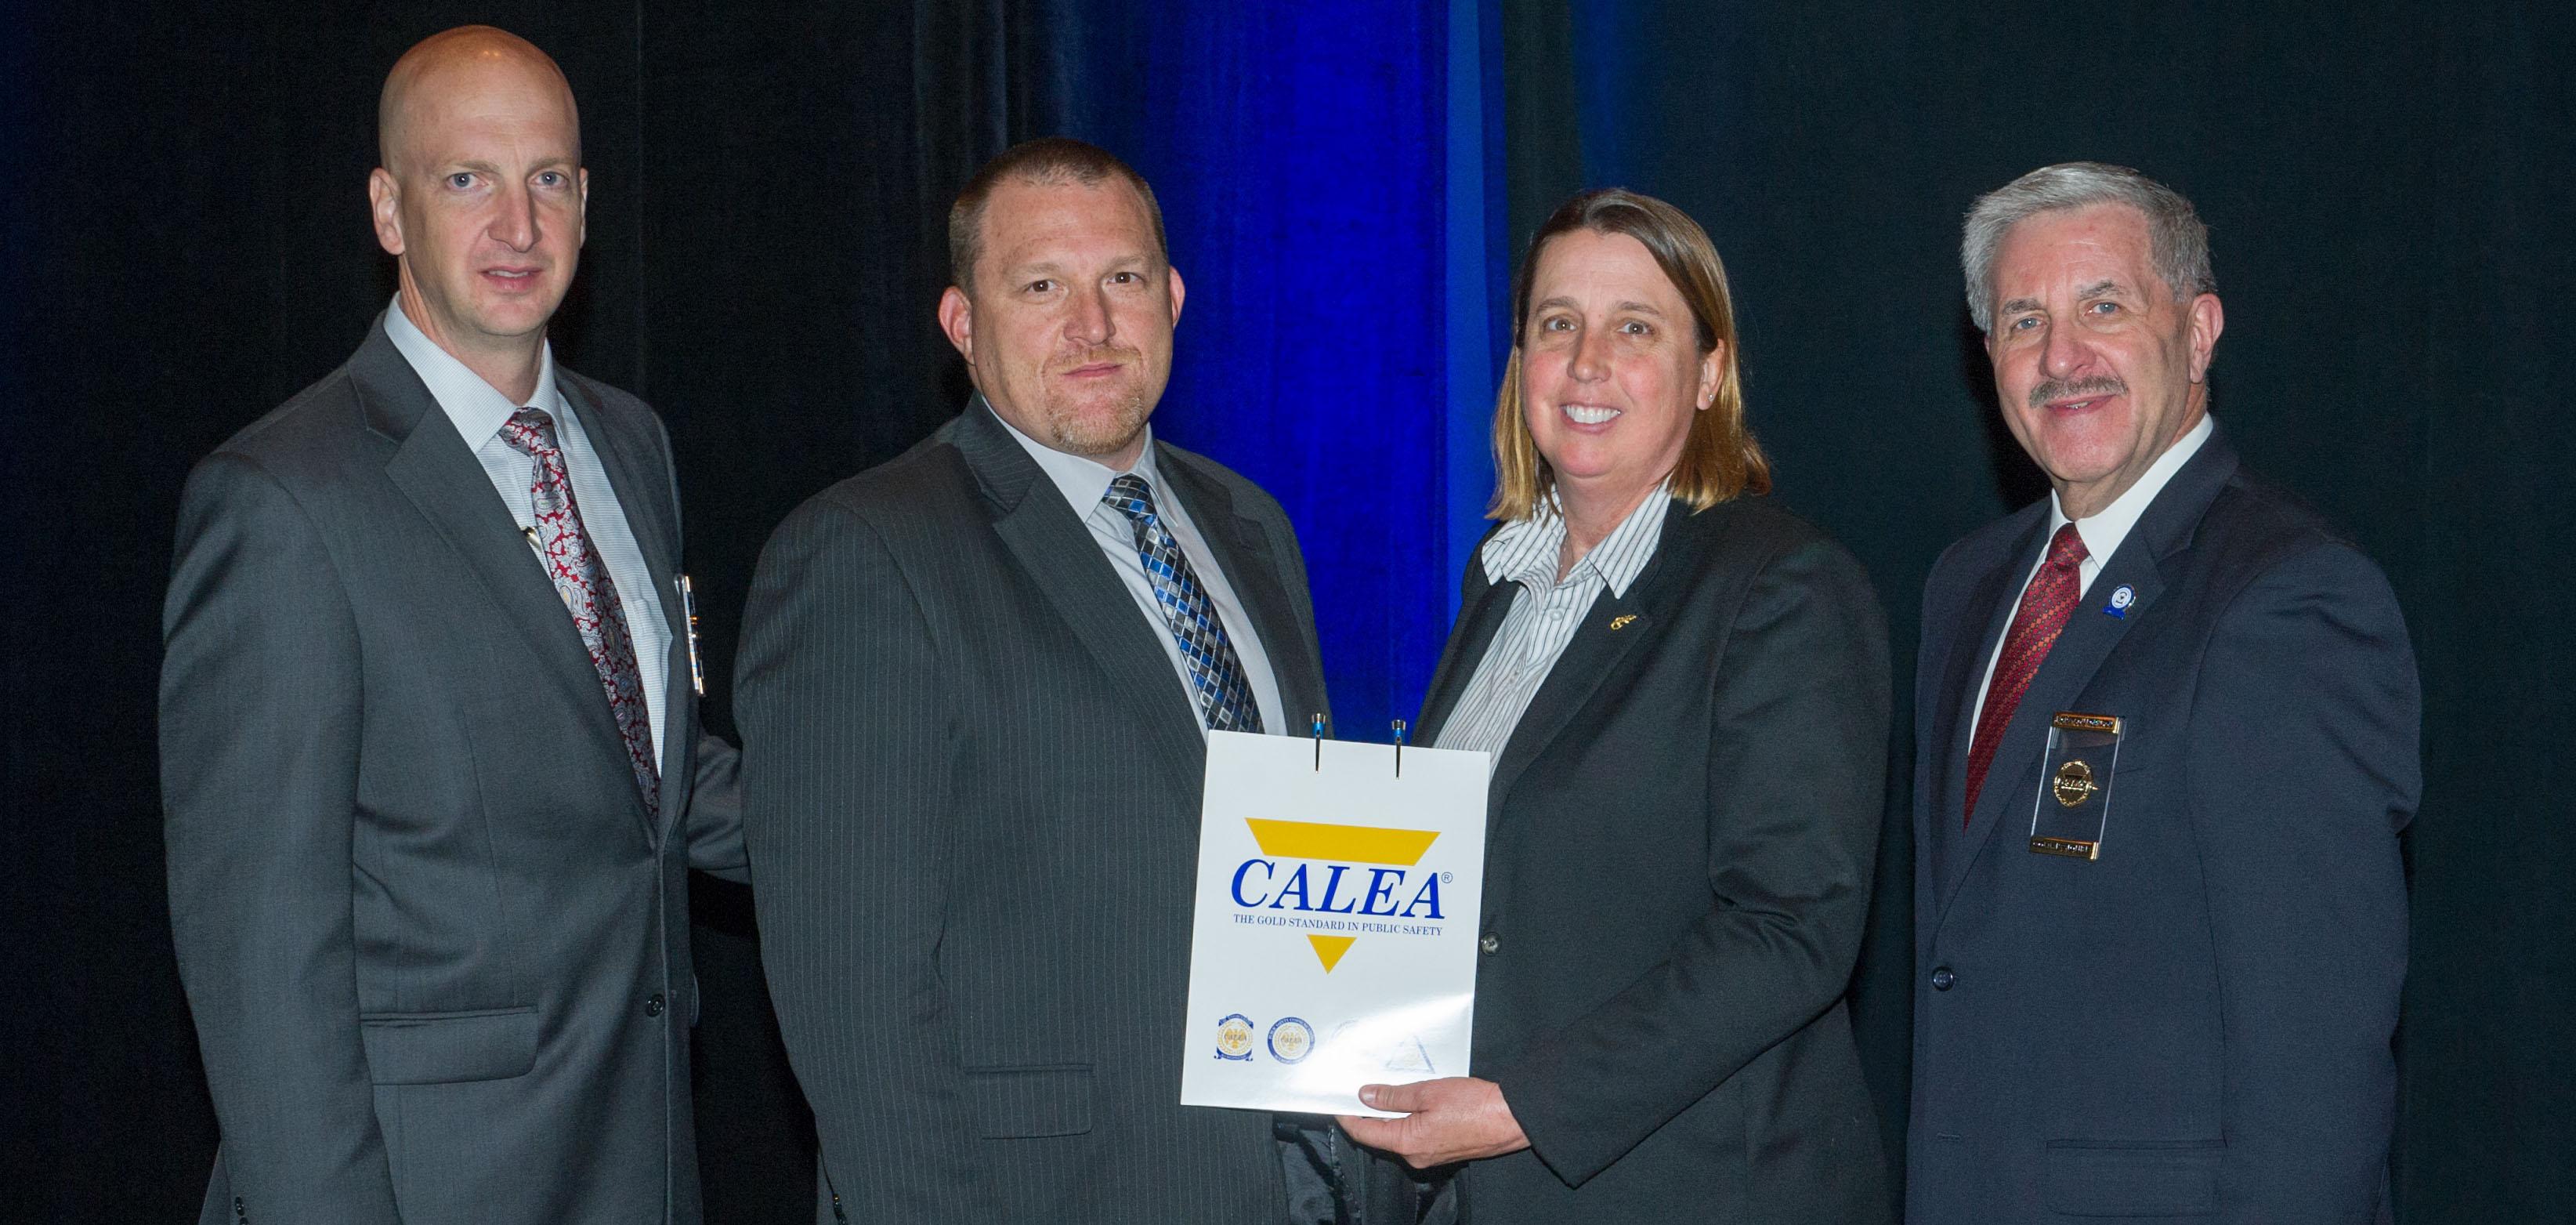 CALEA Award Presentation